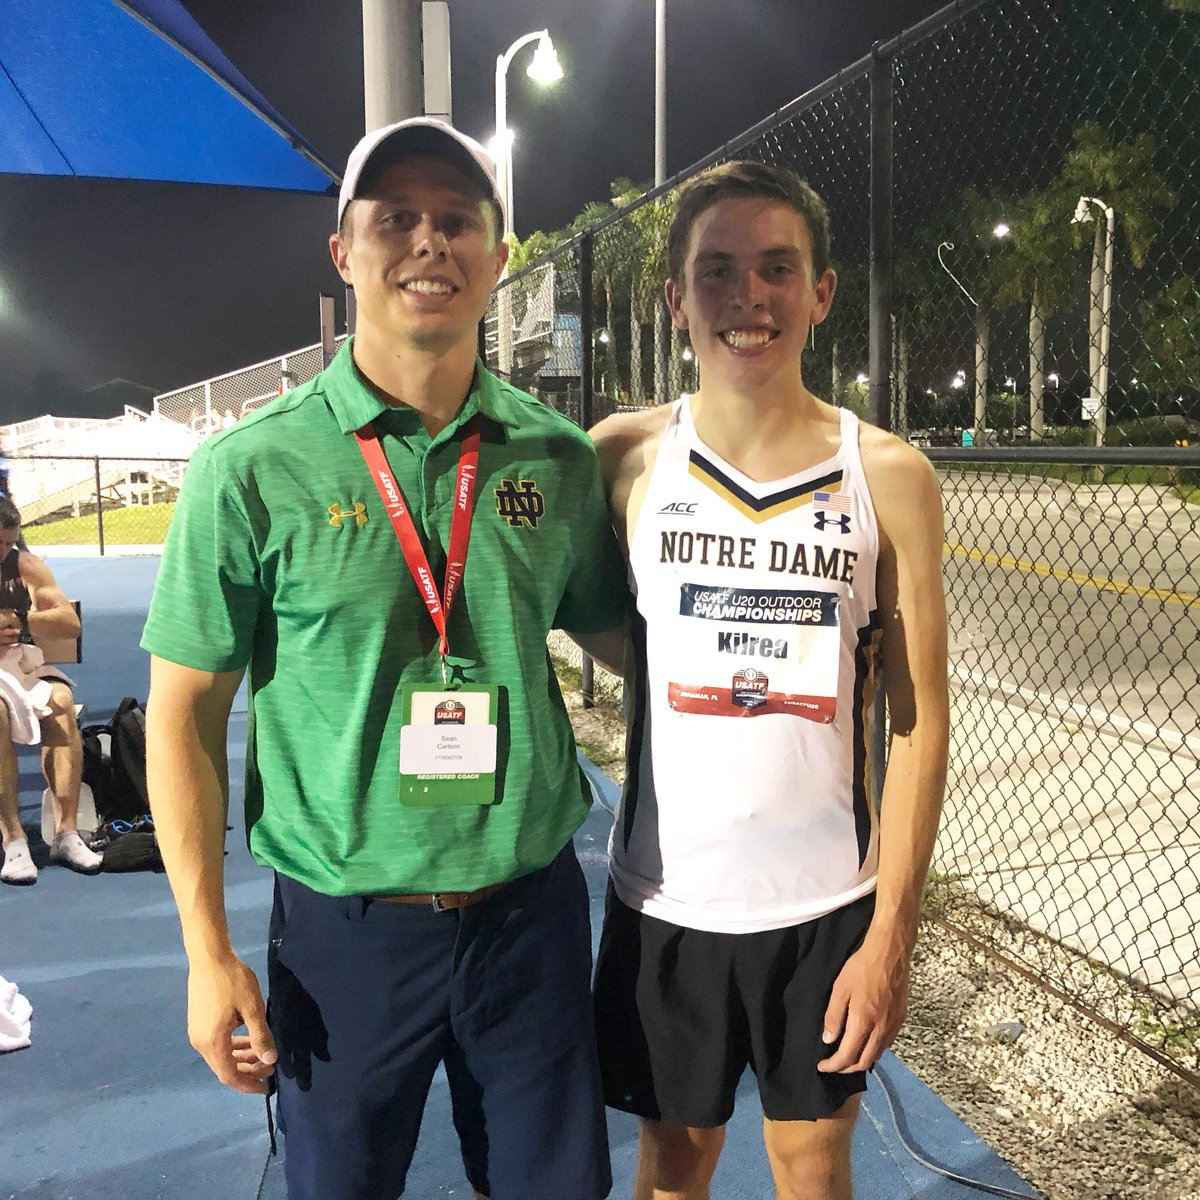 Notre Dame Freshmen Danny Kilrea Wins USATF U20 10,000-meter race